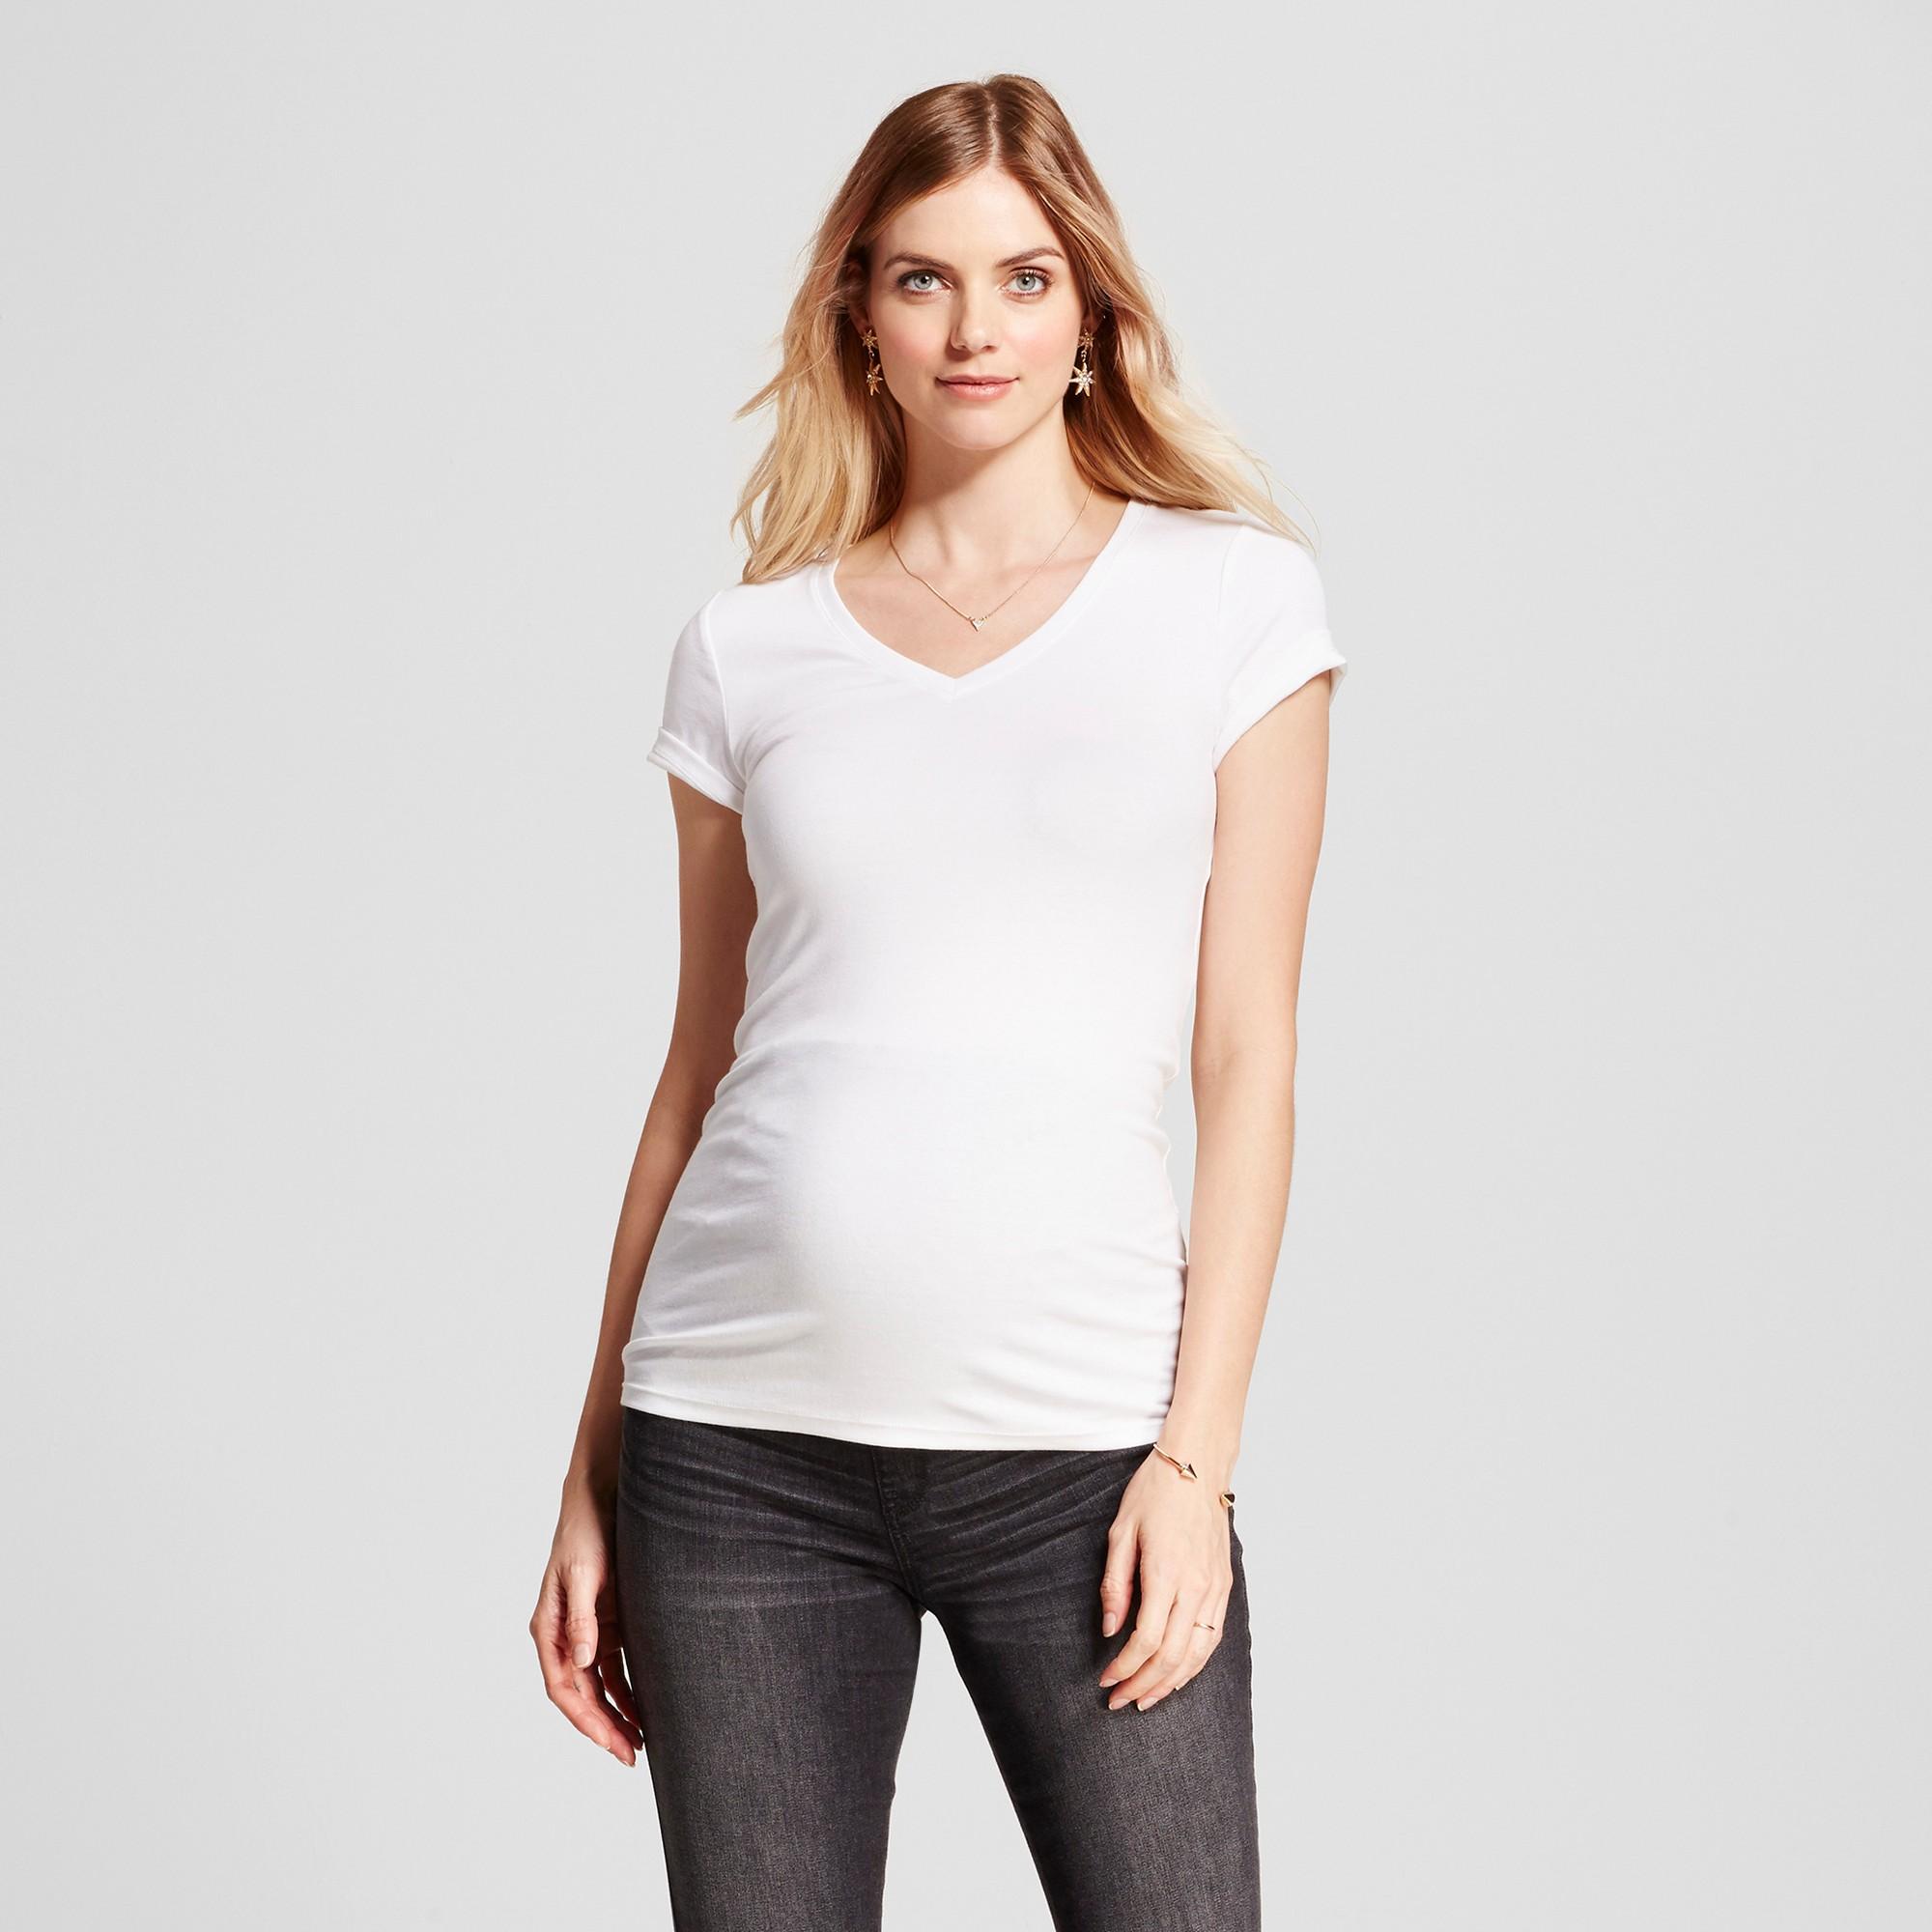 05099a2f Maternity V-Neck T-Shirt - Isabel Maternity by Ingrid & Isabel White Xxl,  Women's